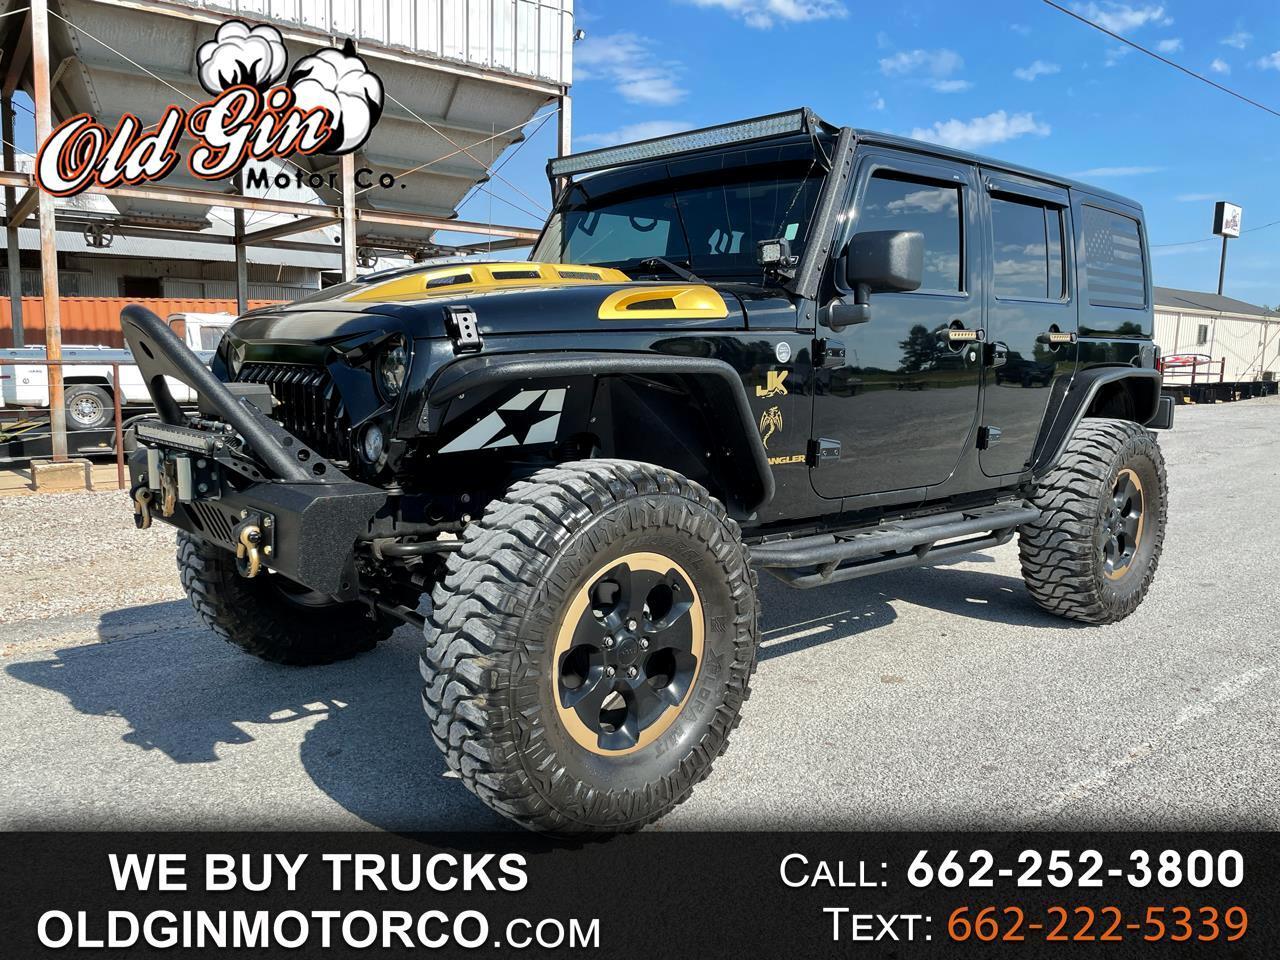 2014 Jeep Wrangler Sahara Unlimited 4x4